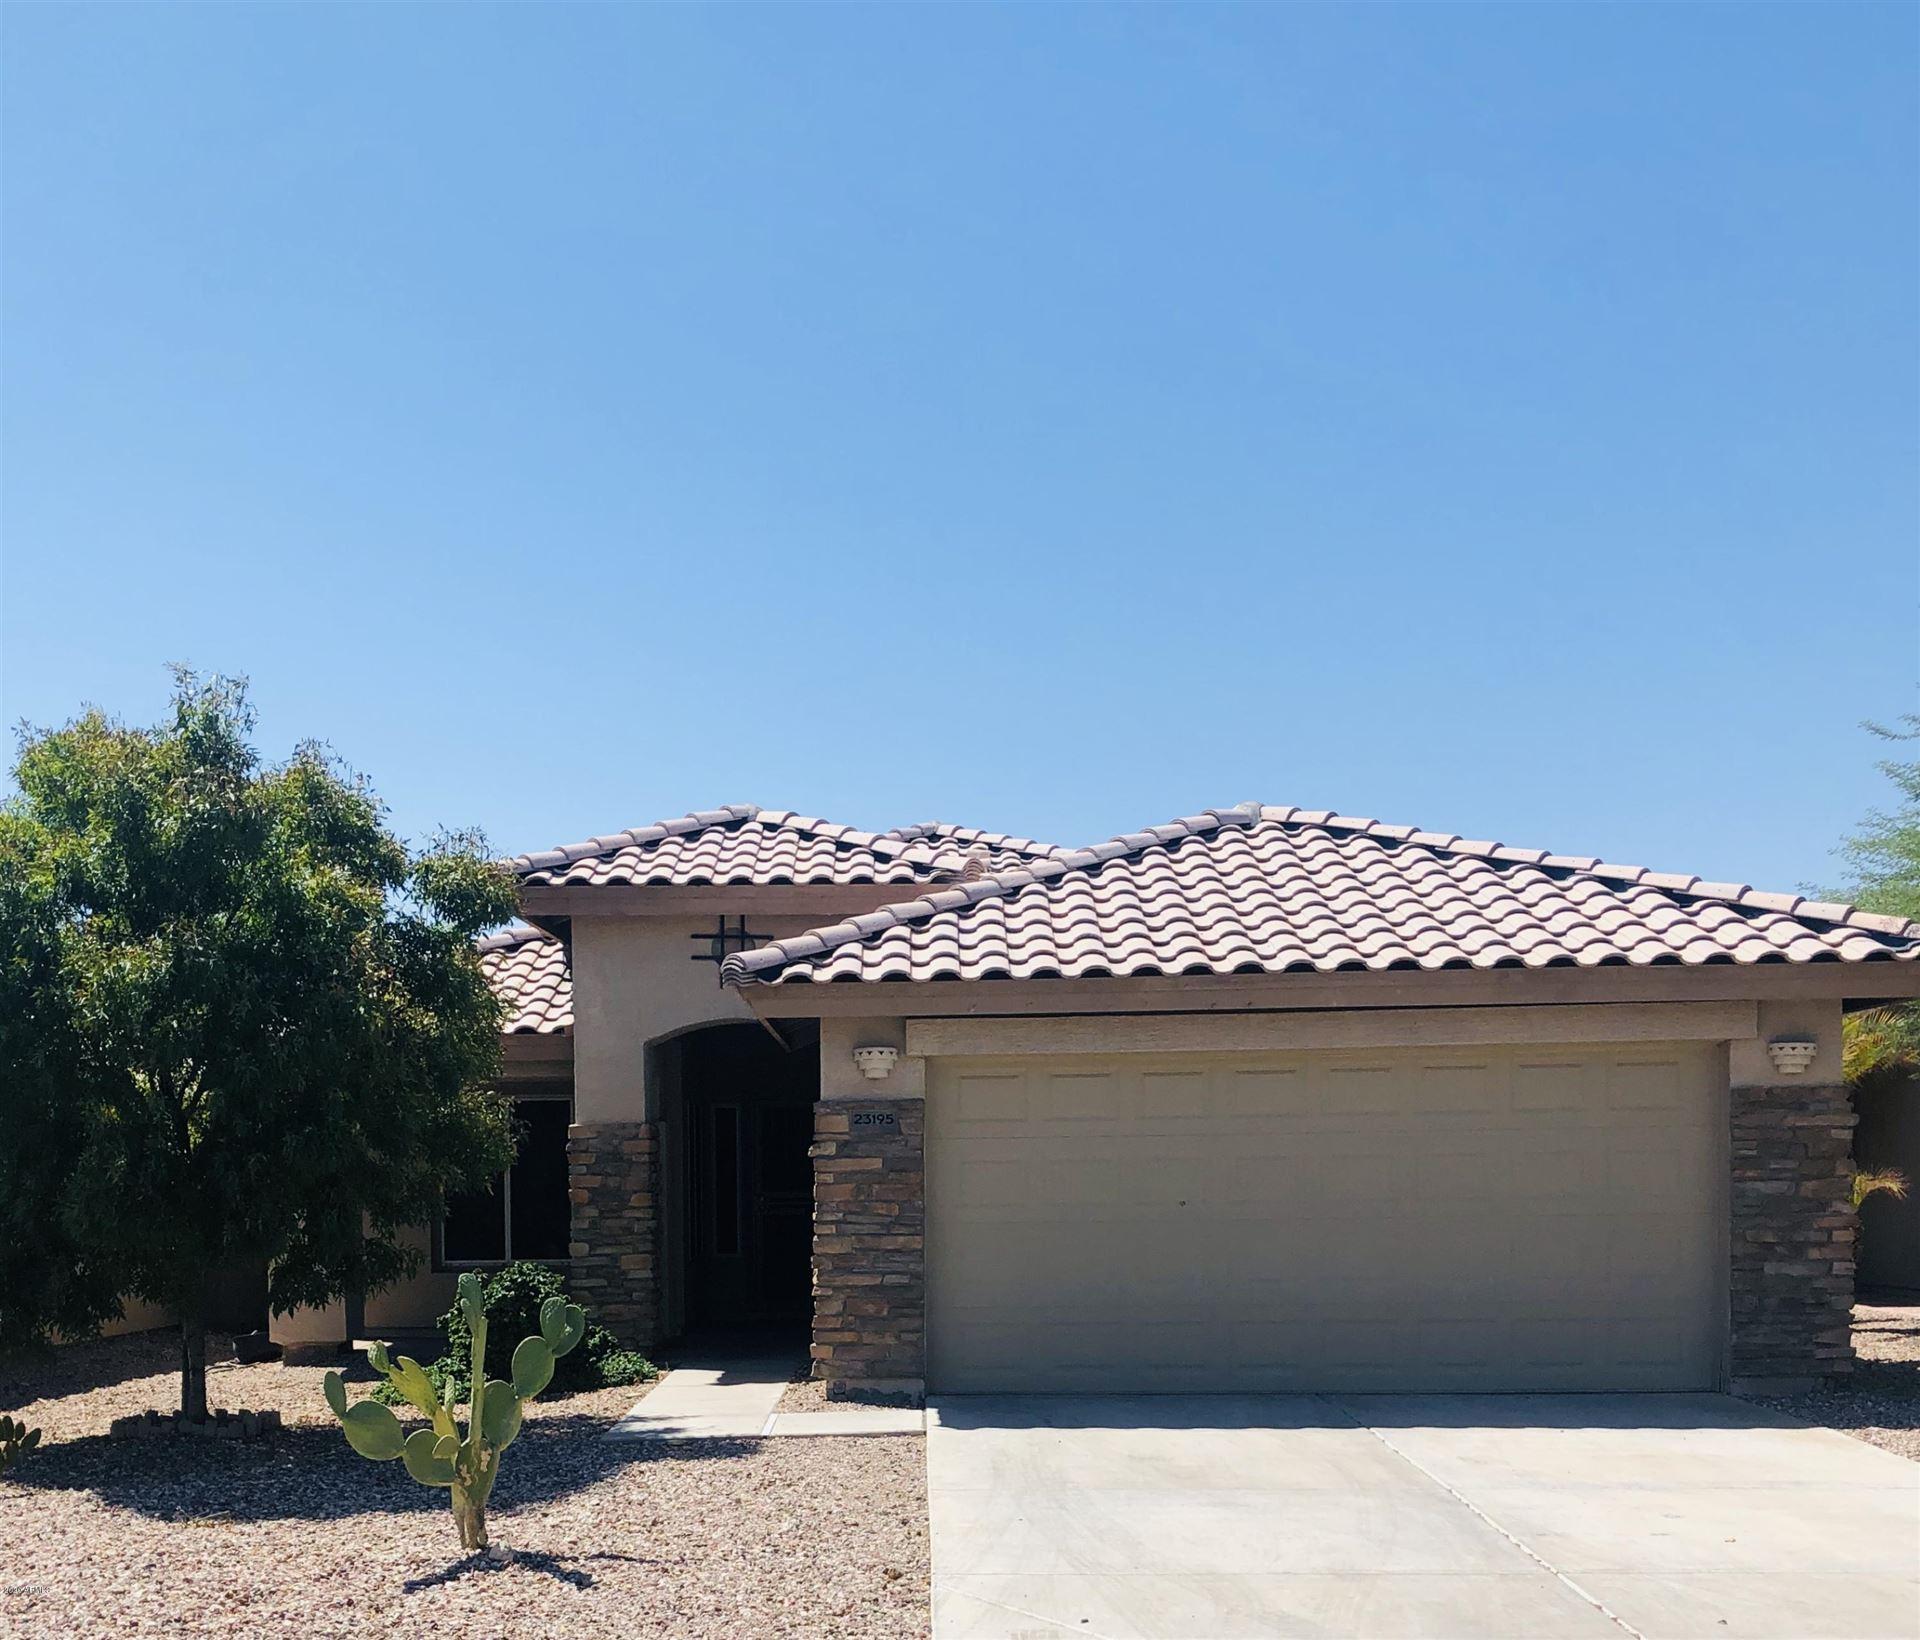 23195 W ANTELOPE Trail, Buckeye, AZ 85326 - MLS#: 6128885